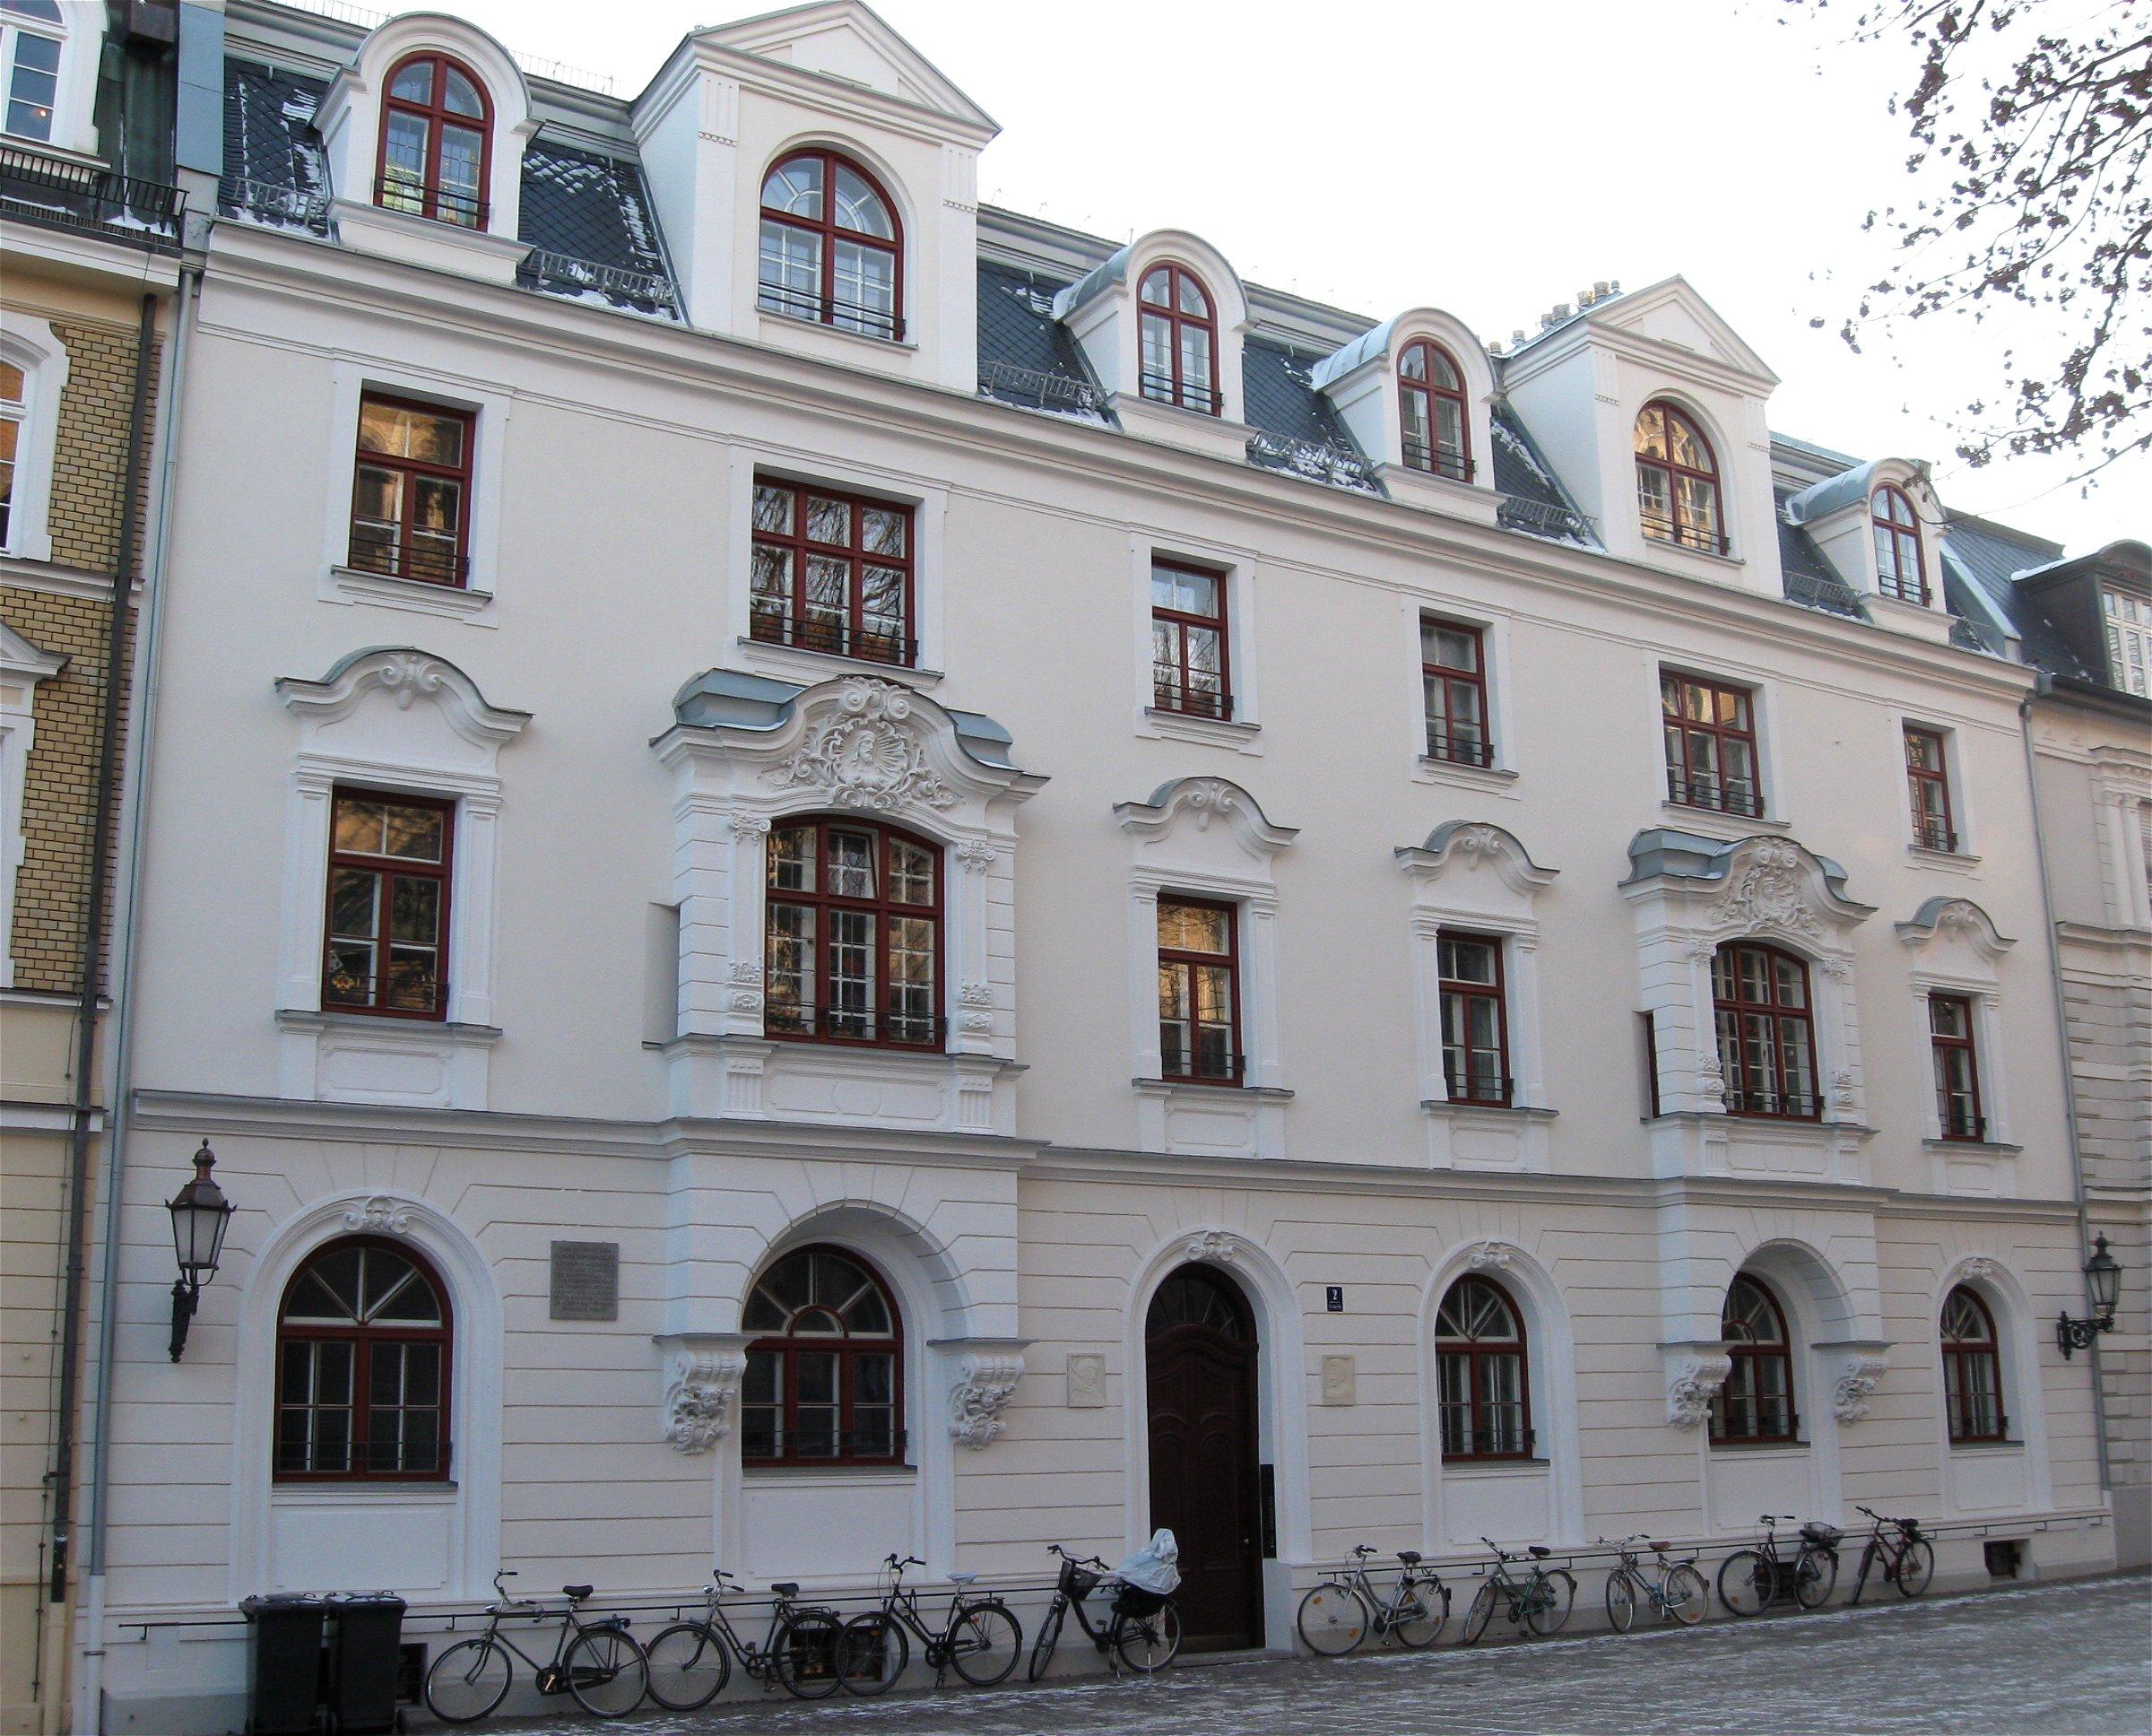 St Platz München file st platz 2 muenchen 1 jpg wikimedia commons